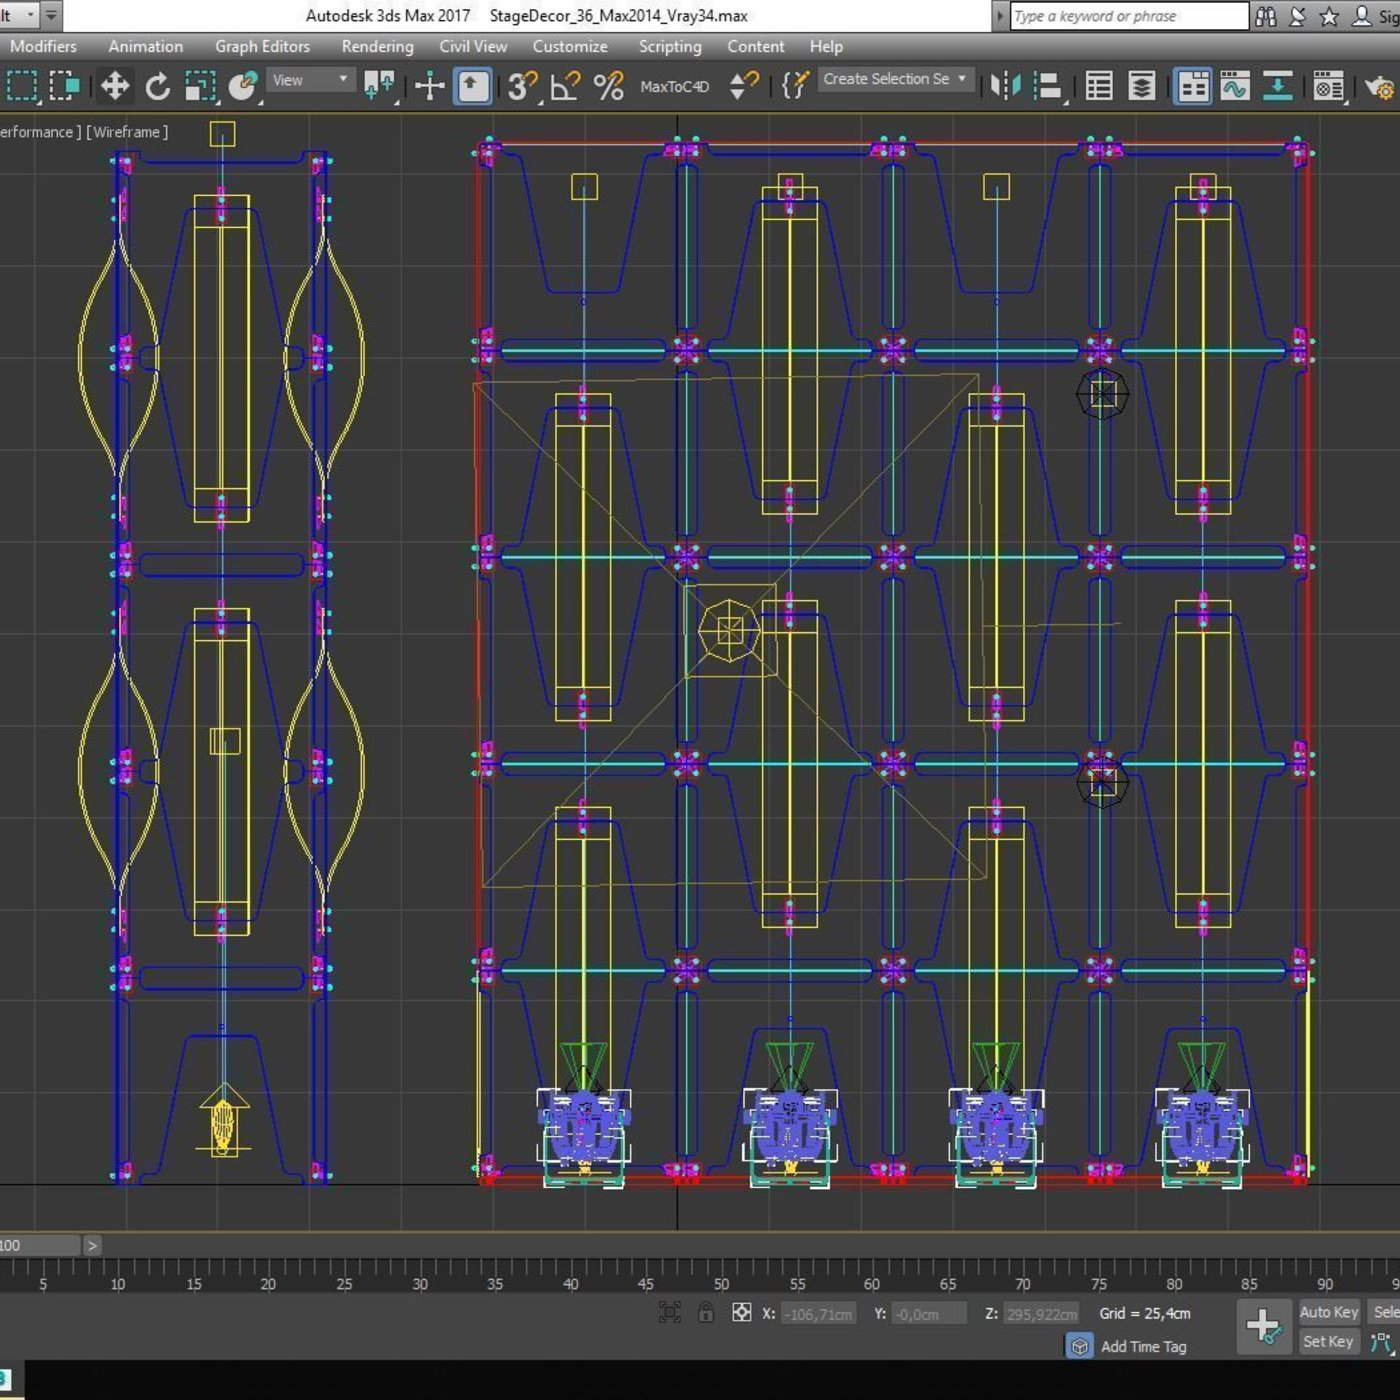 Stage Decor 36 Modular Wall Column